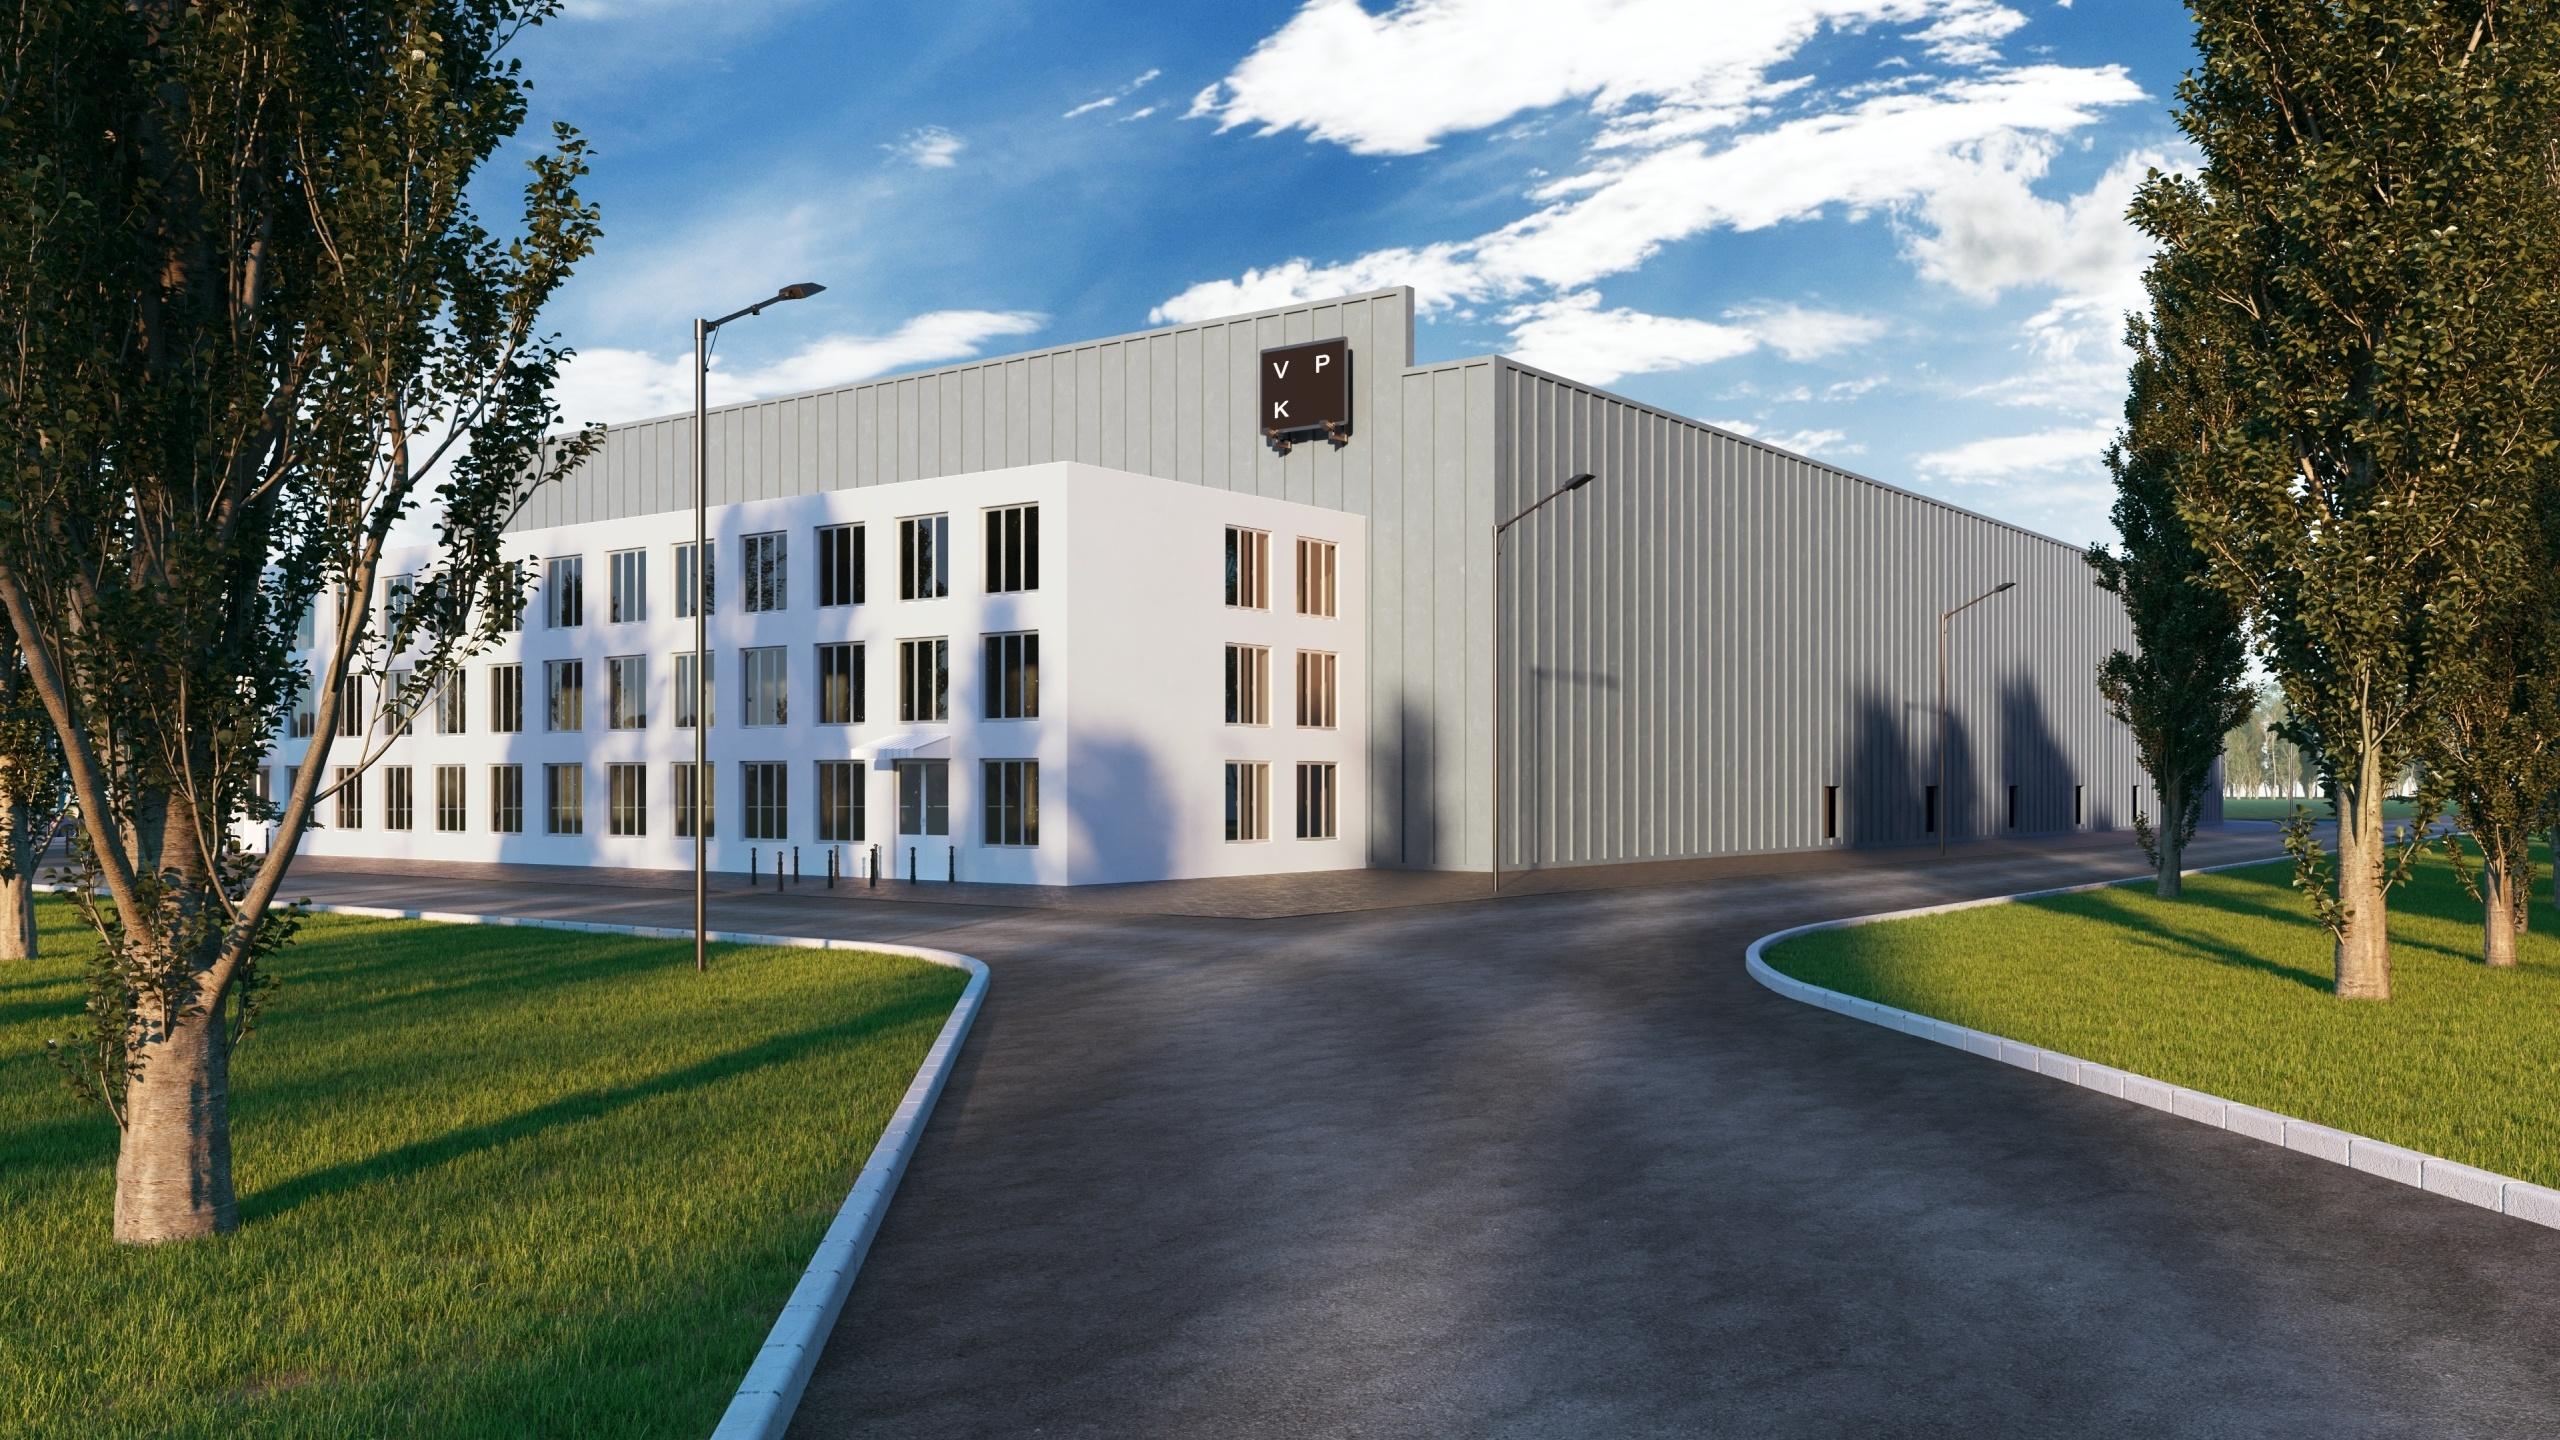 VPK Factory - Cam_01-2 2560px.jpg